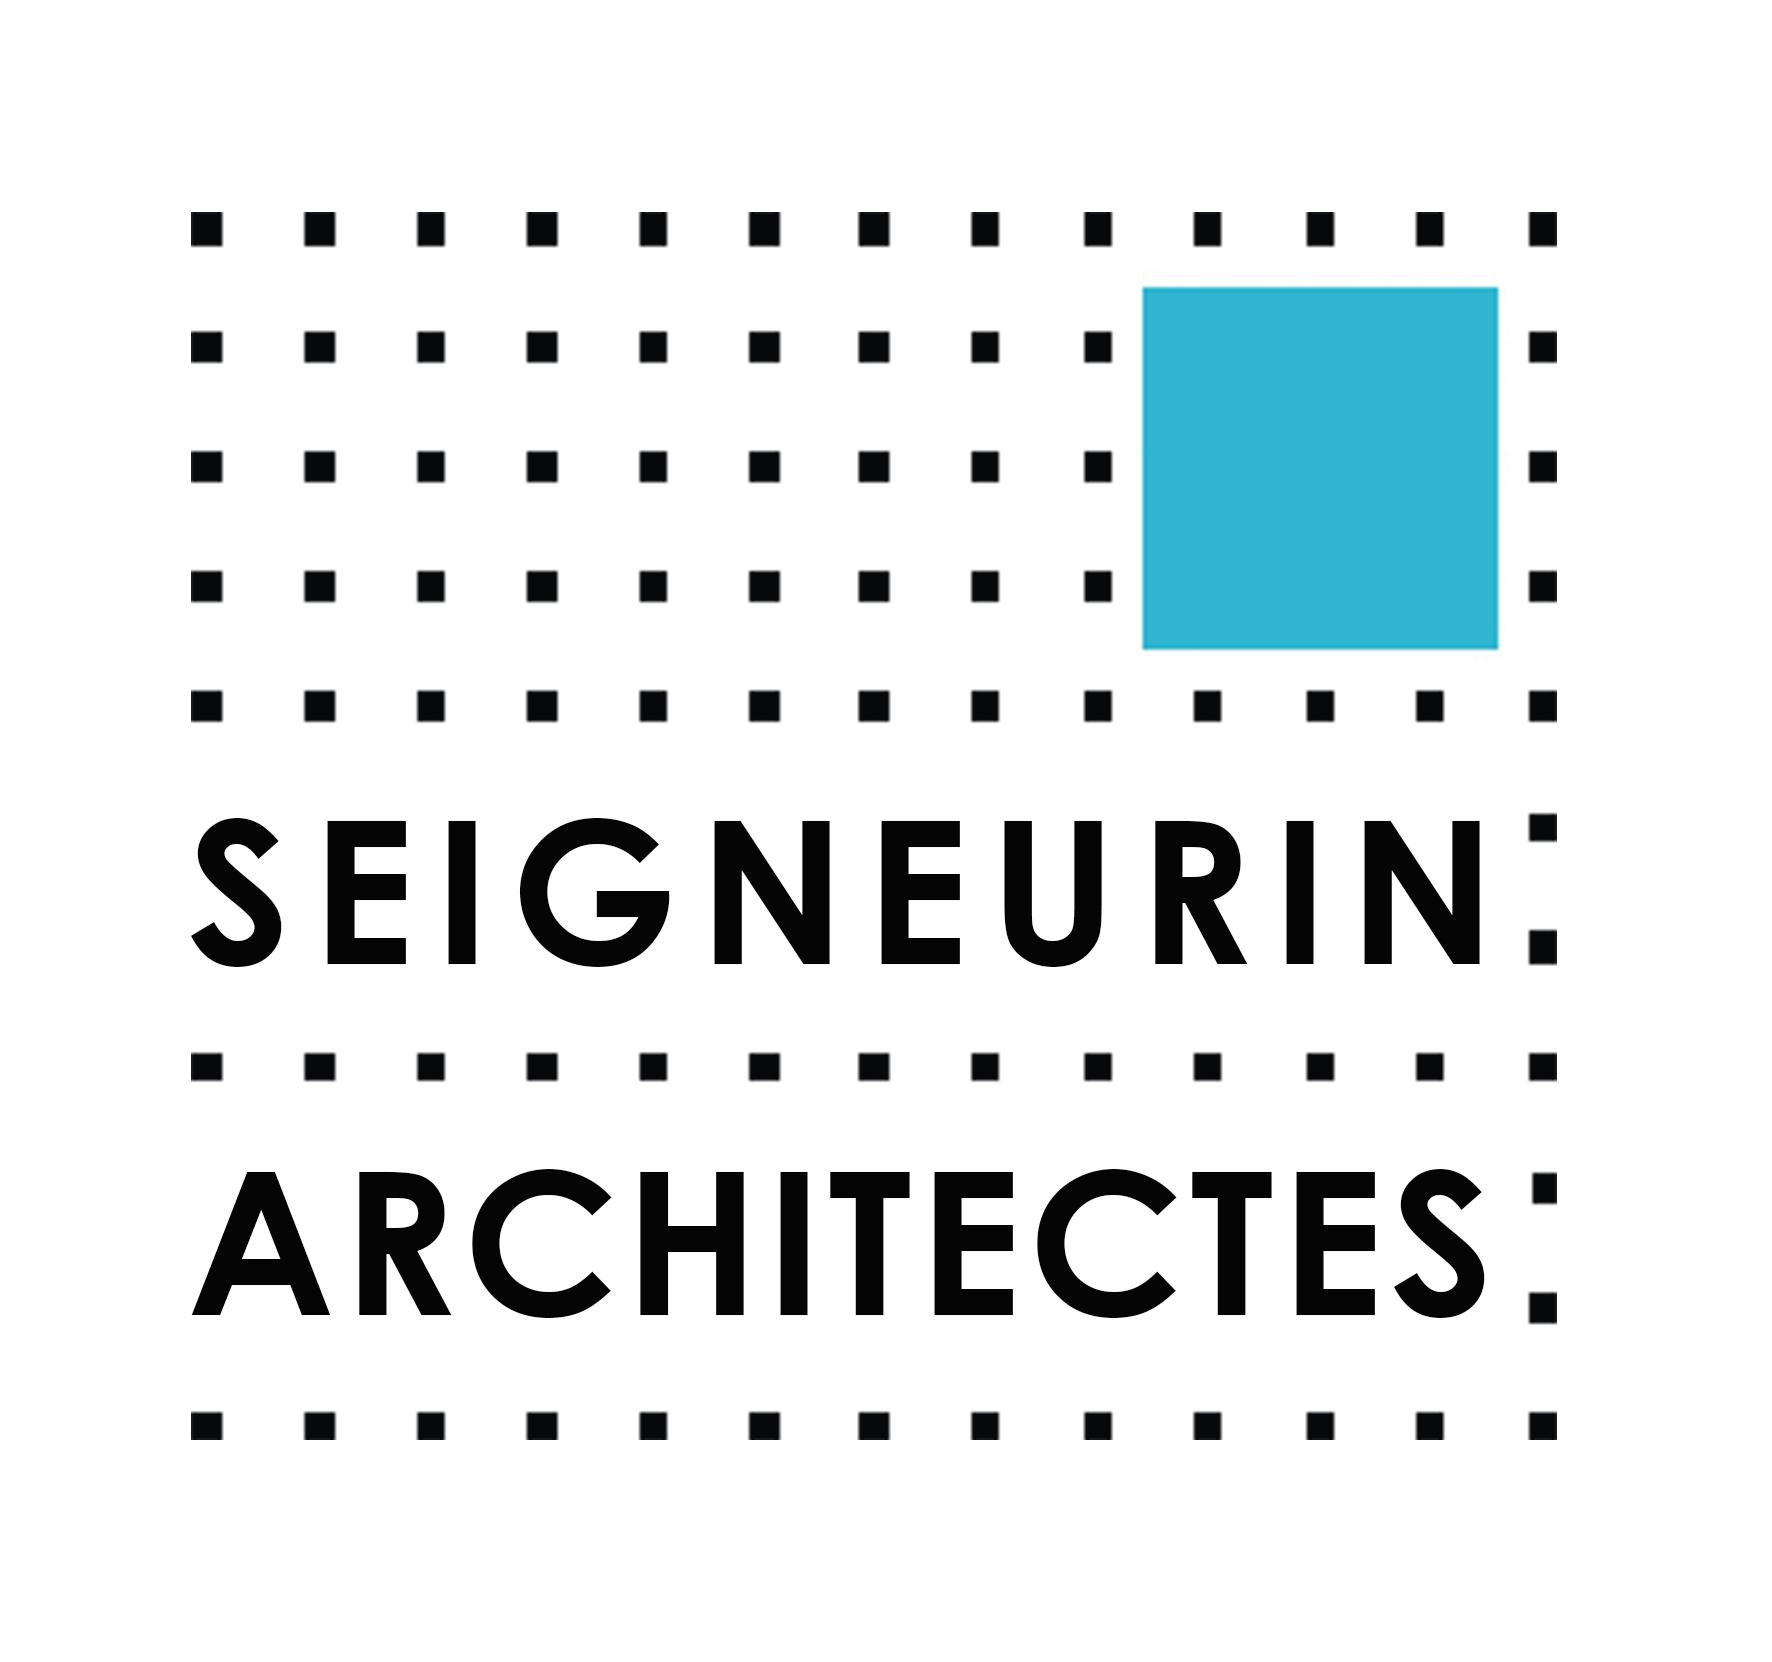 Seigneurin Architectes